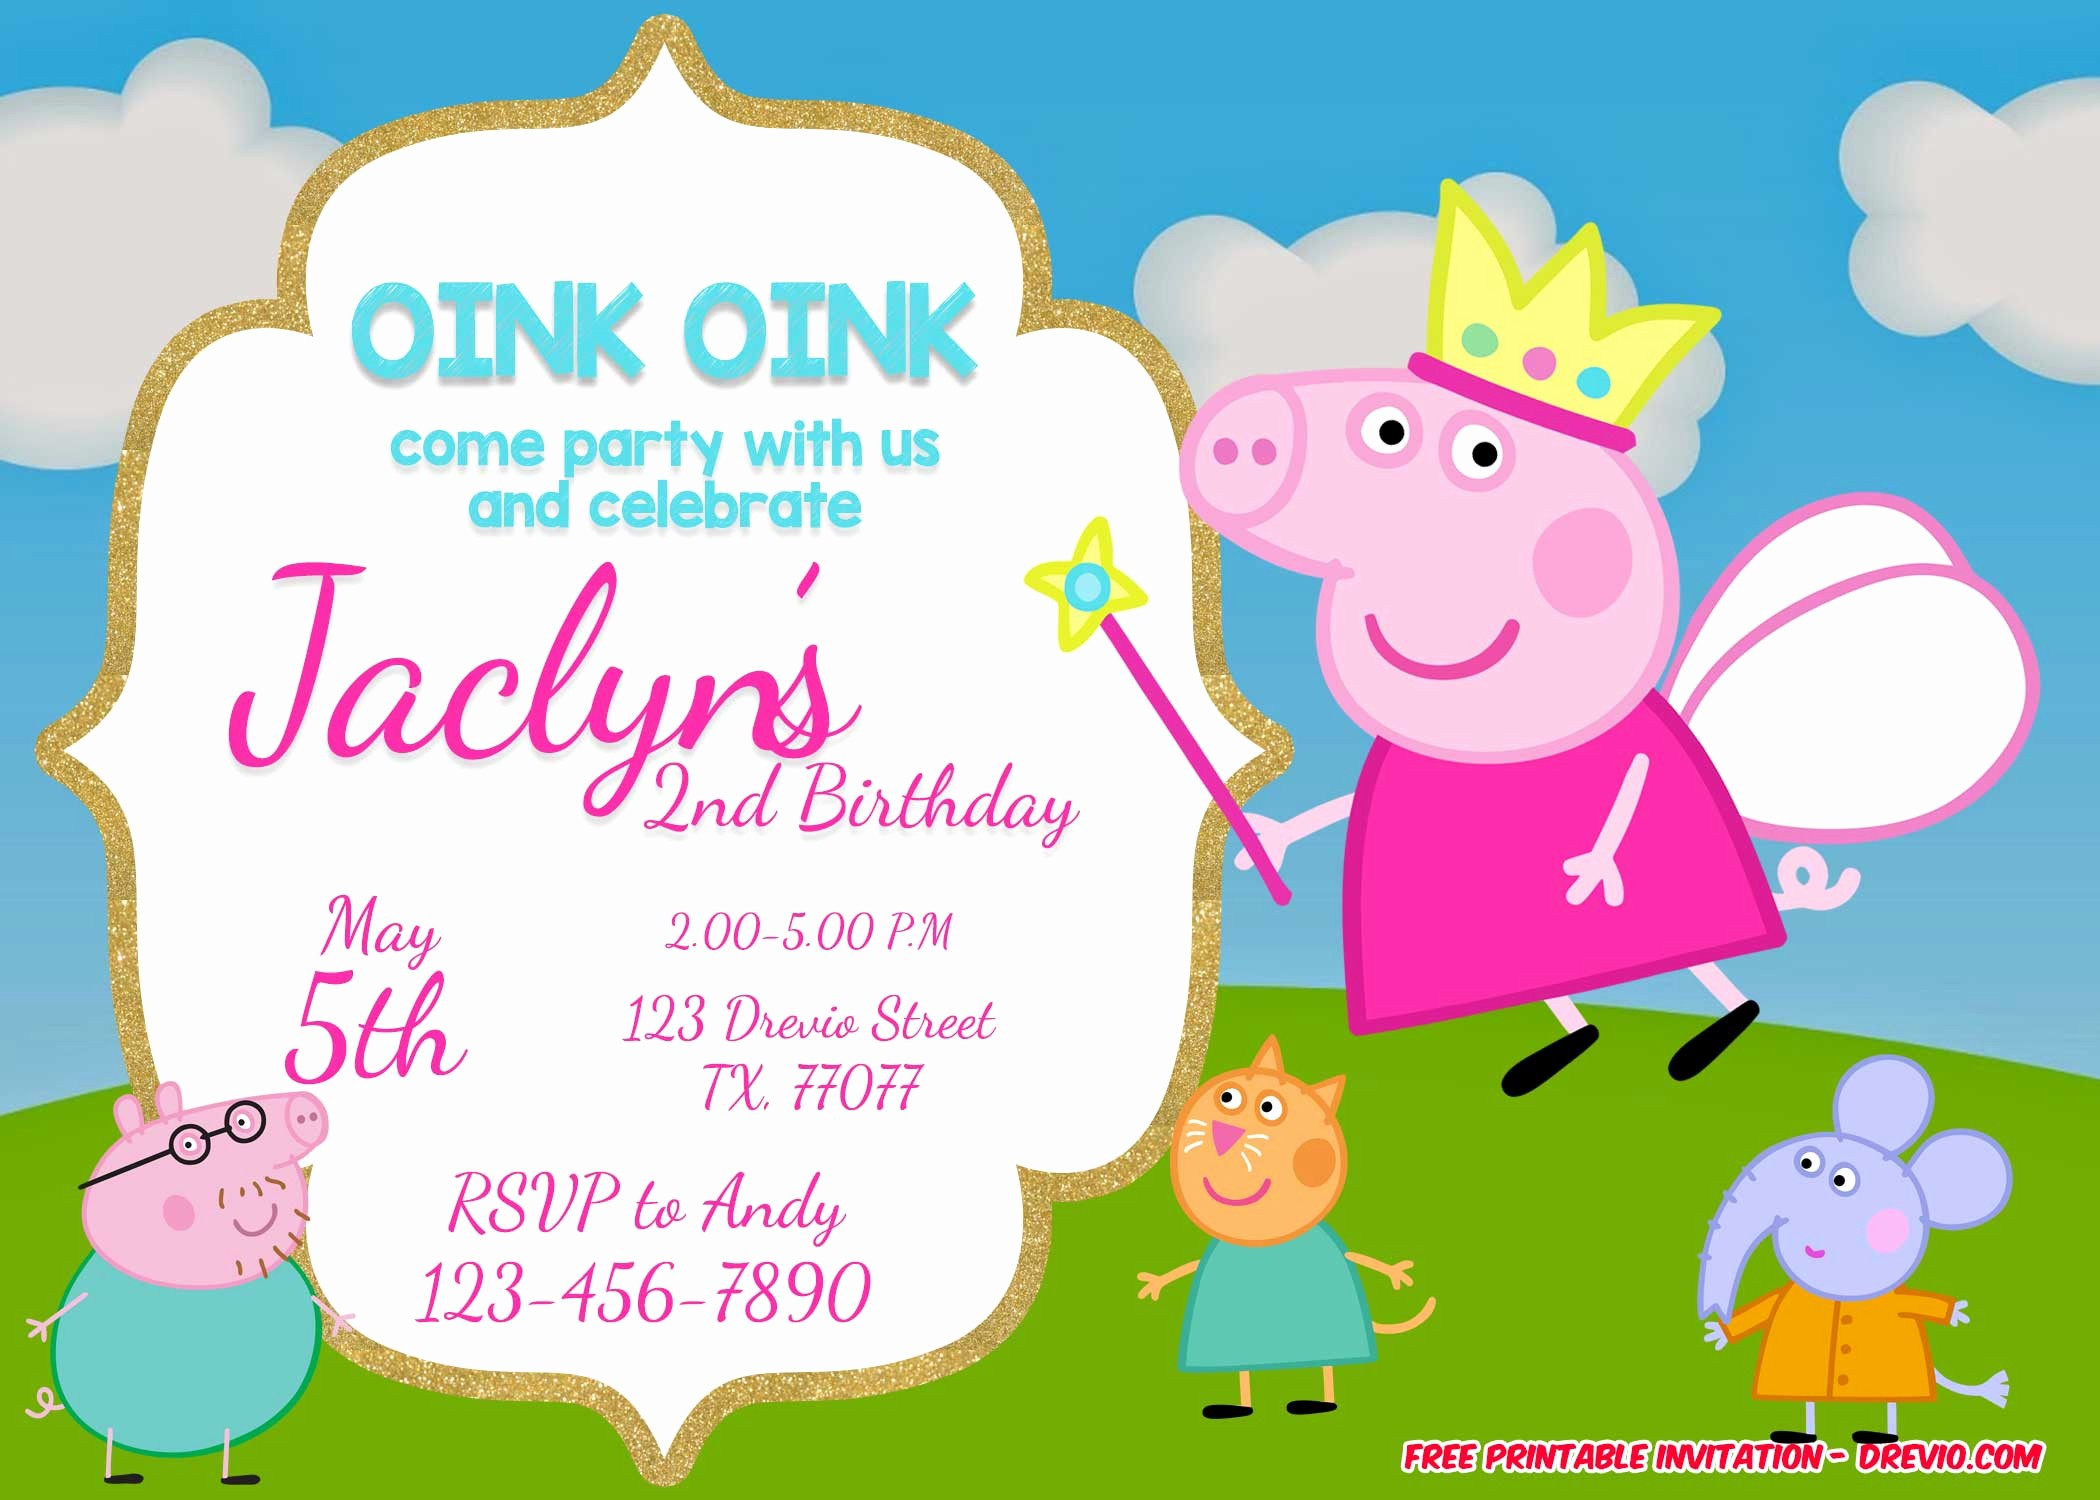 Free Templates for Birthday Invitations Fresh Free Printable Peppa Pig Invitation Birthday Templates